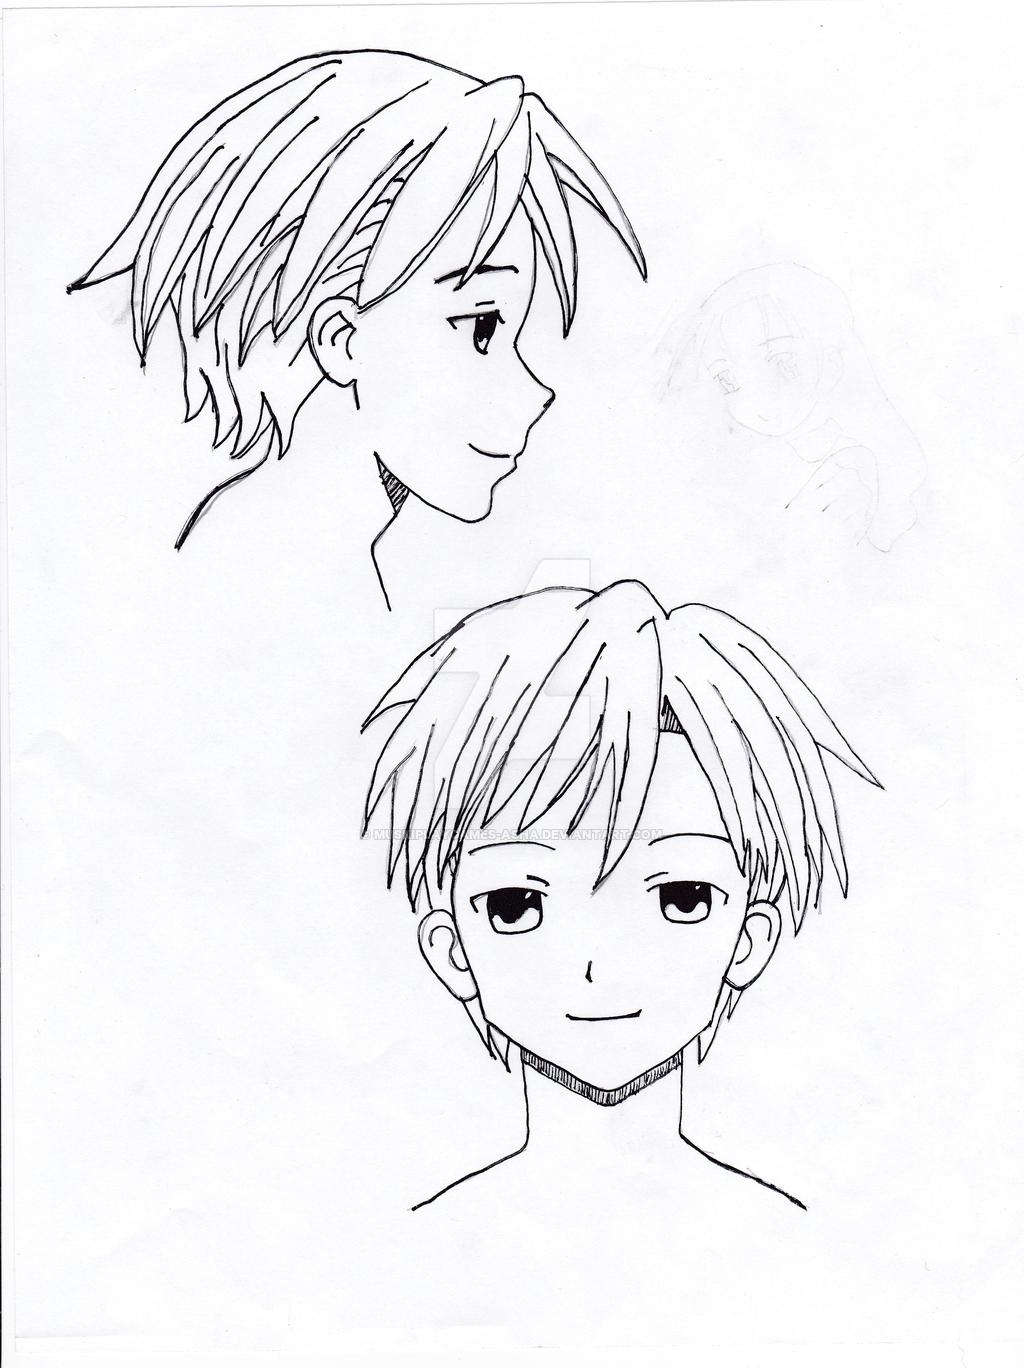 1024x1368 Anime Style Drawings Teen Mangaanime Style Boymuskiplaygames Asha